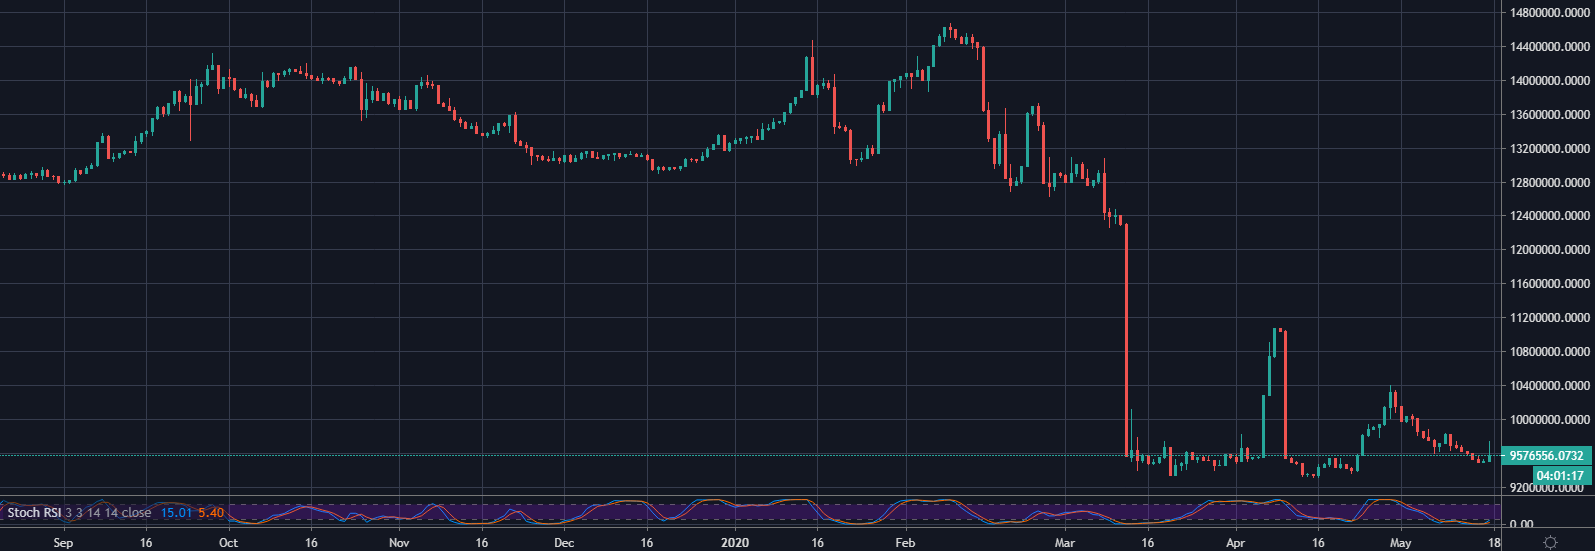 Bitfinex EOS/USD Longs 1D September 2019 - May 2020: TradingView